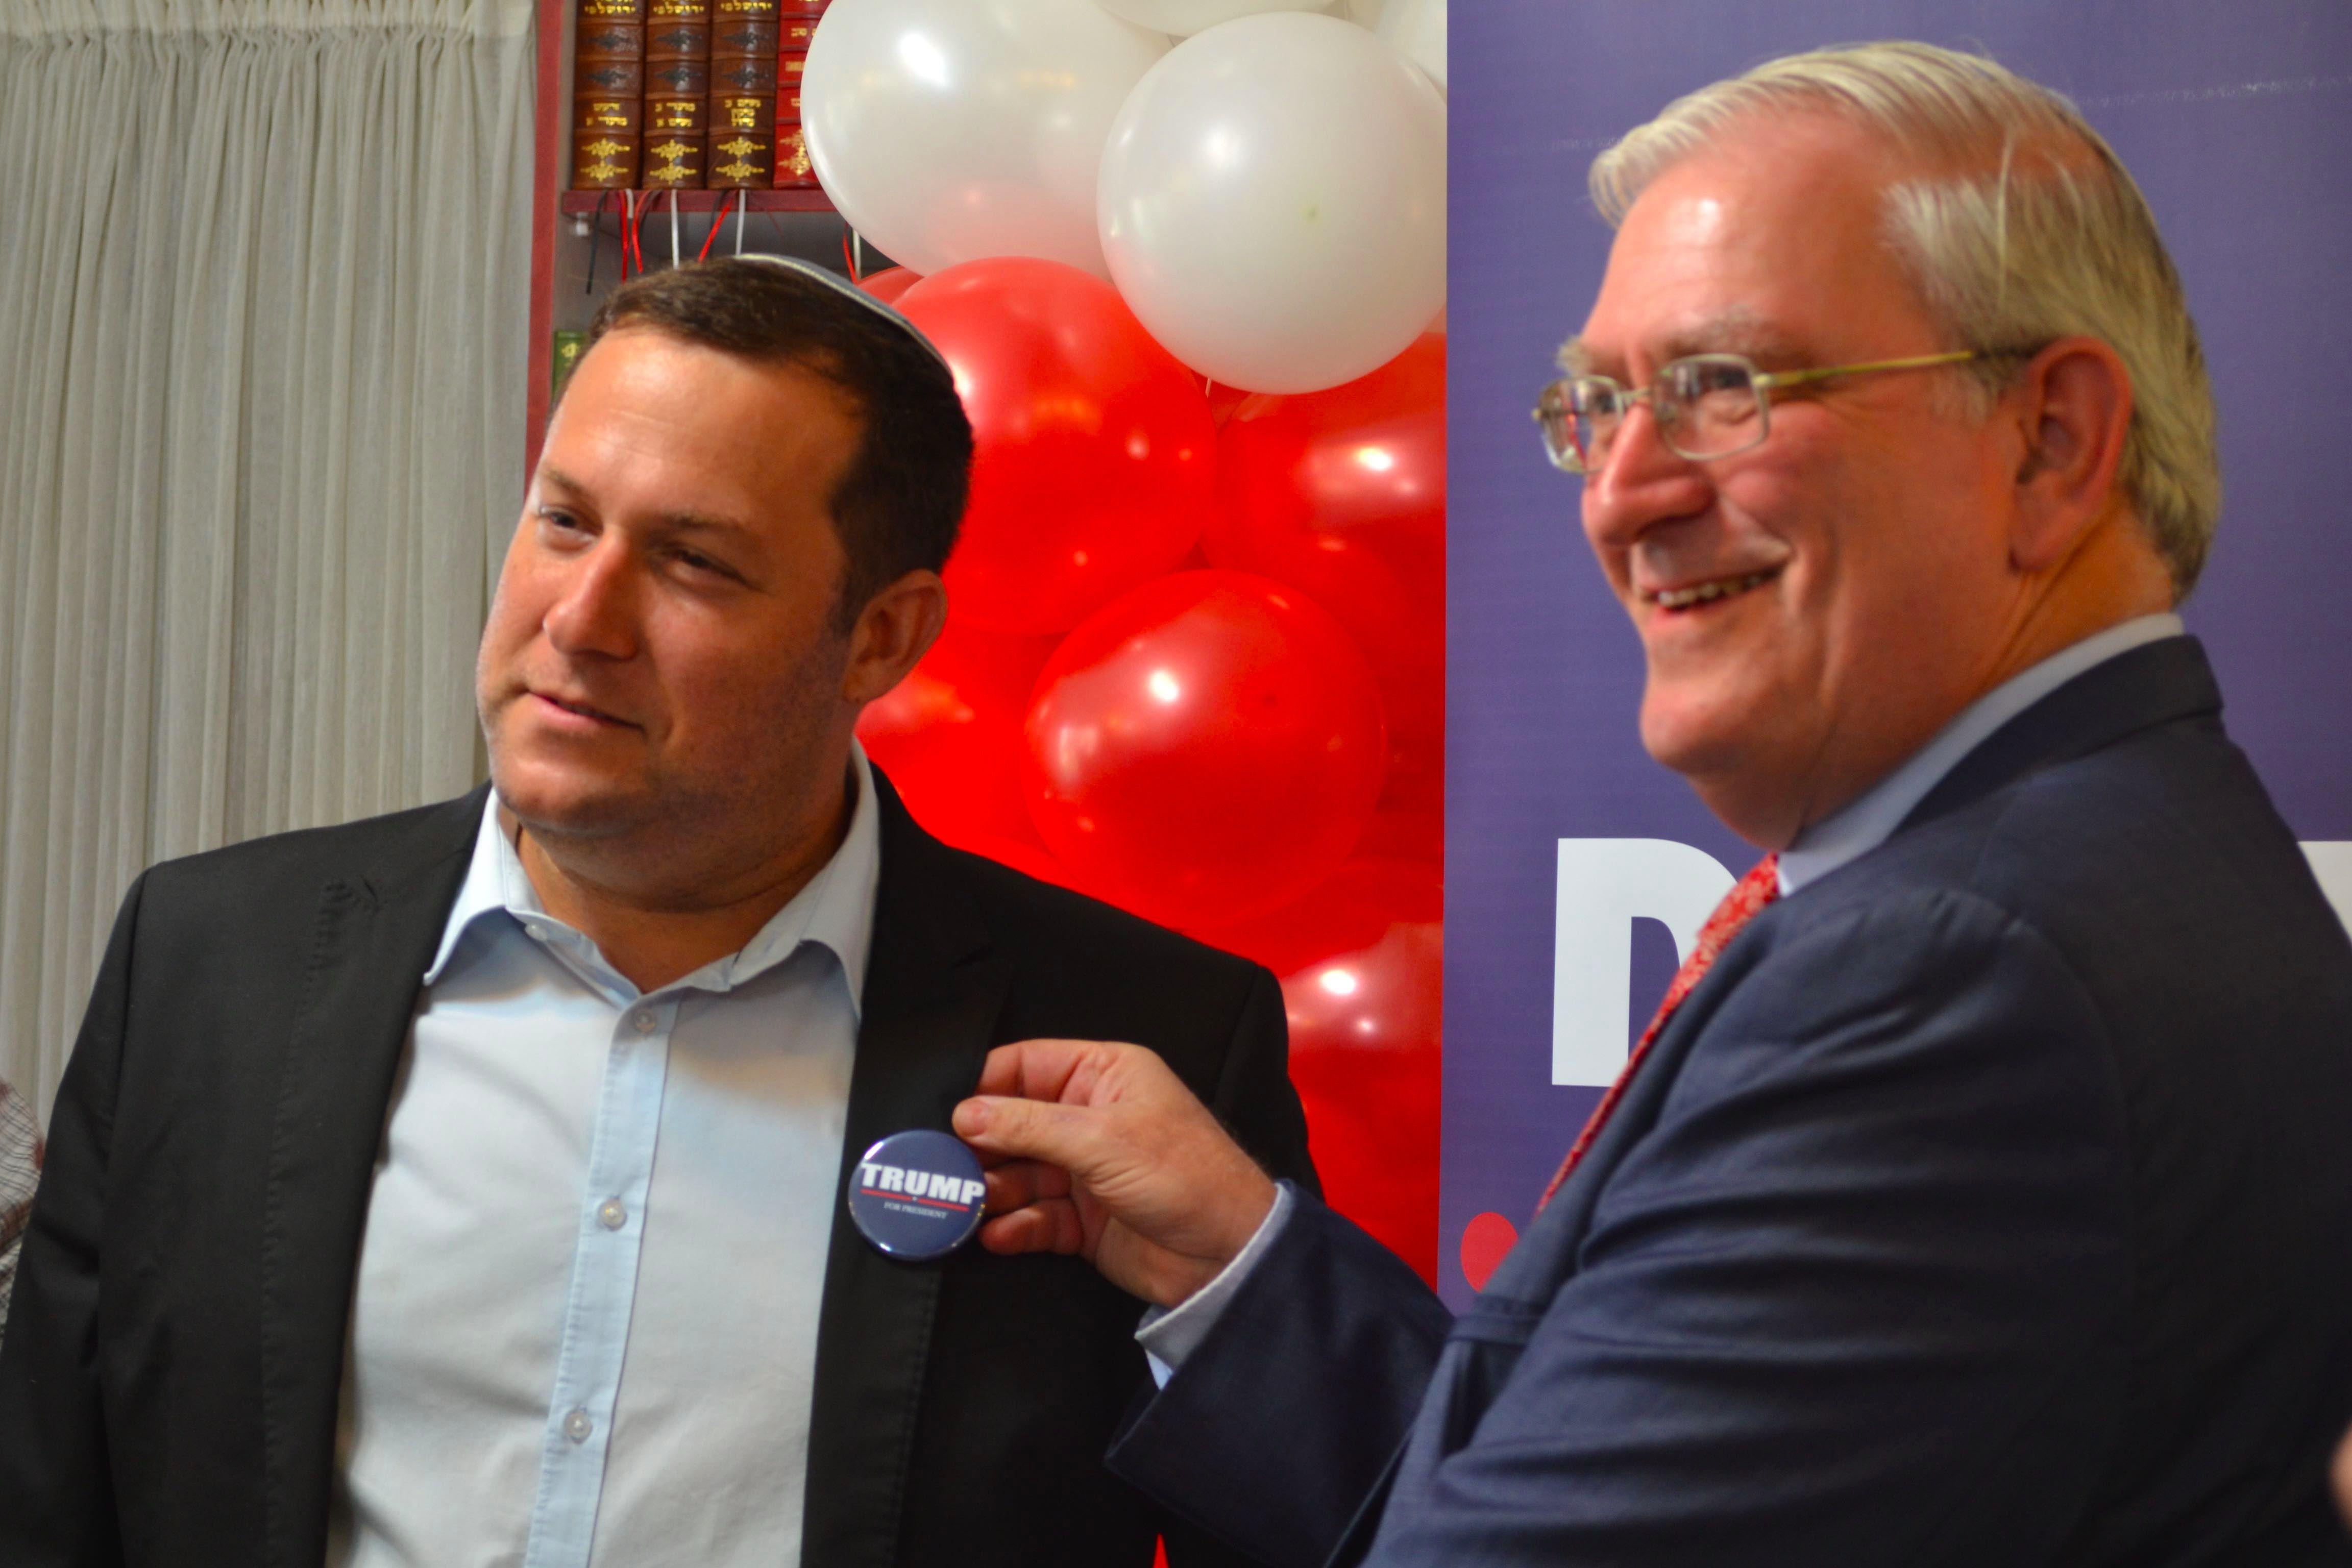 Marc Zell of Republican Overseas Israel (right) pins a Trump pin on settler leader Yossi Dagan.